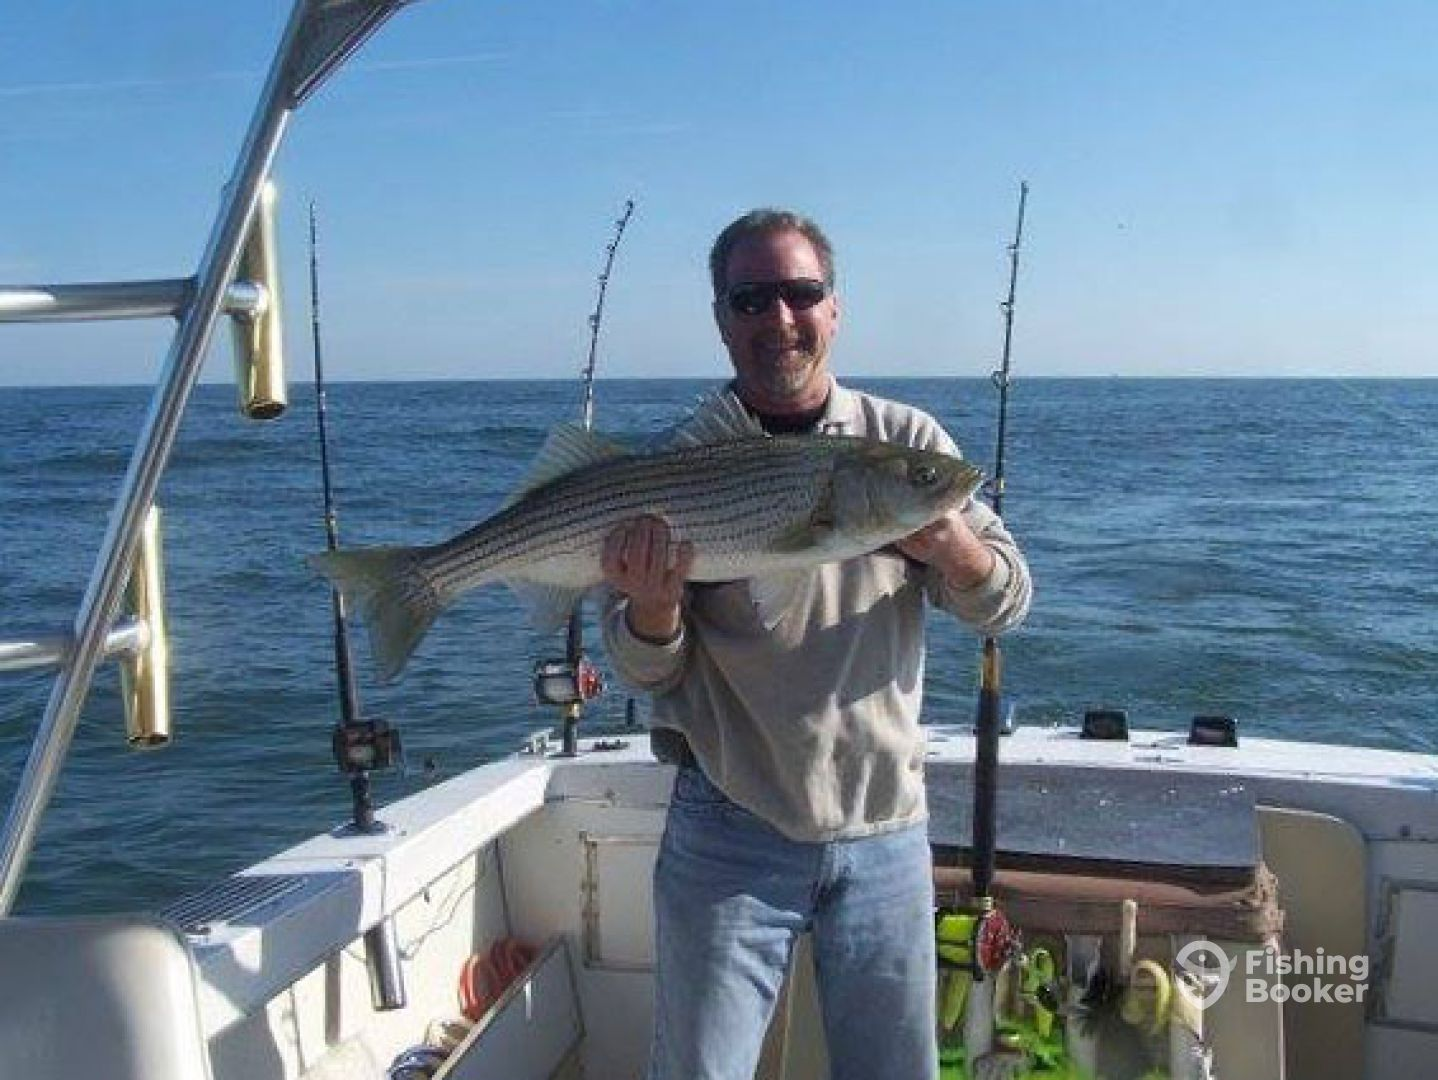 Fishhook sport fishing norfolk va fishingbooker for Va fishing charters